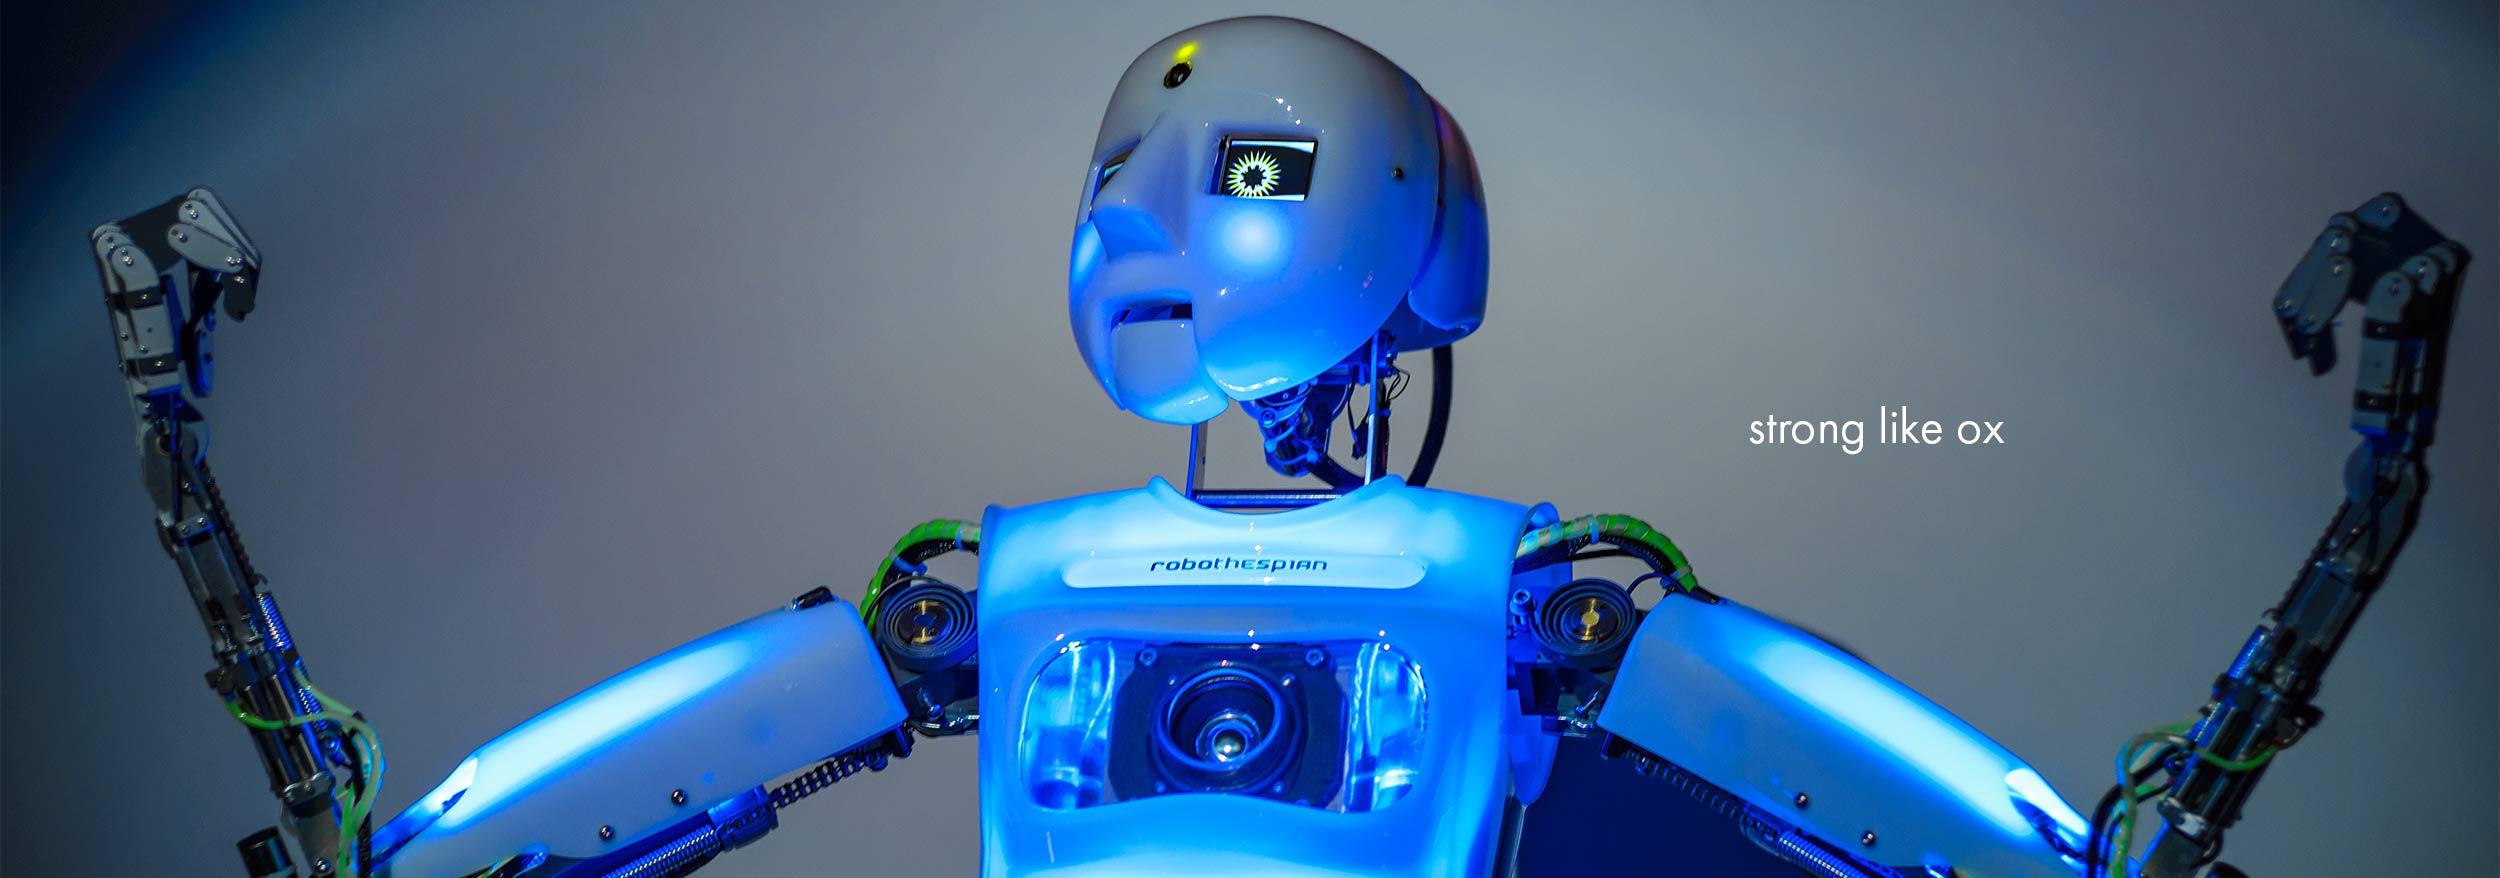 Robotic Theatre, RoboThespian Strong Like Ox